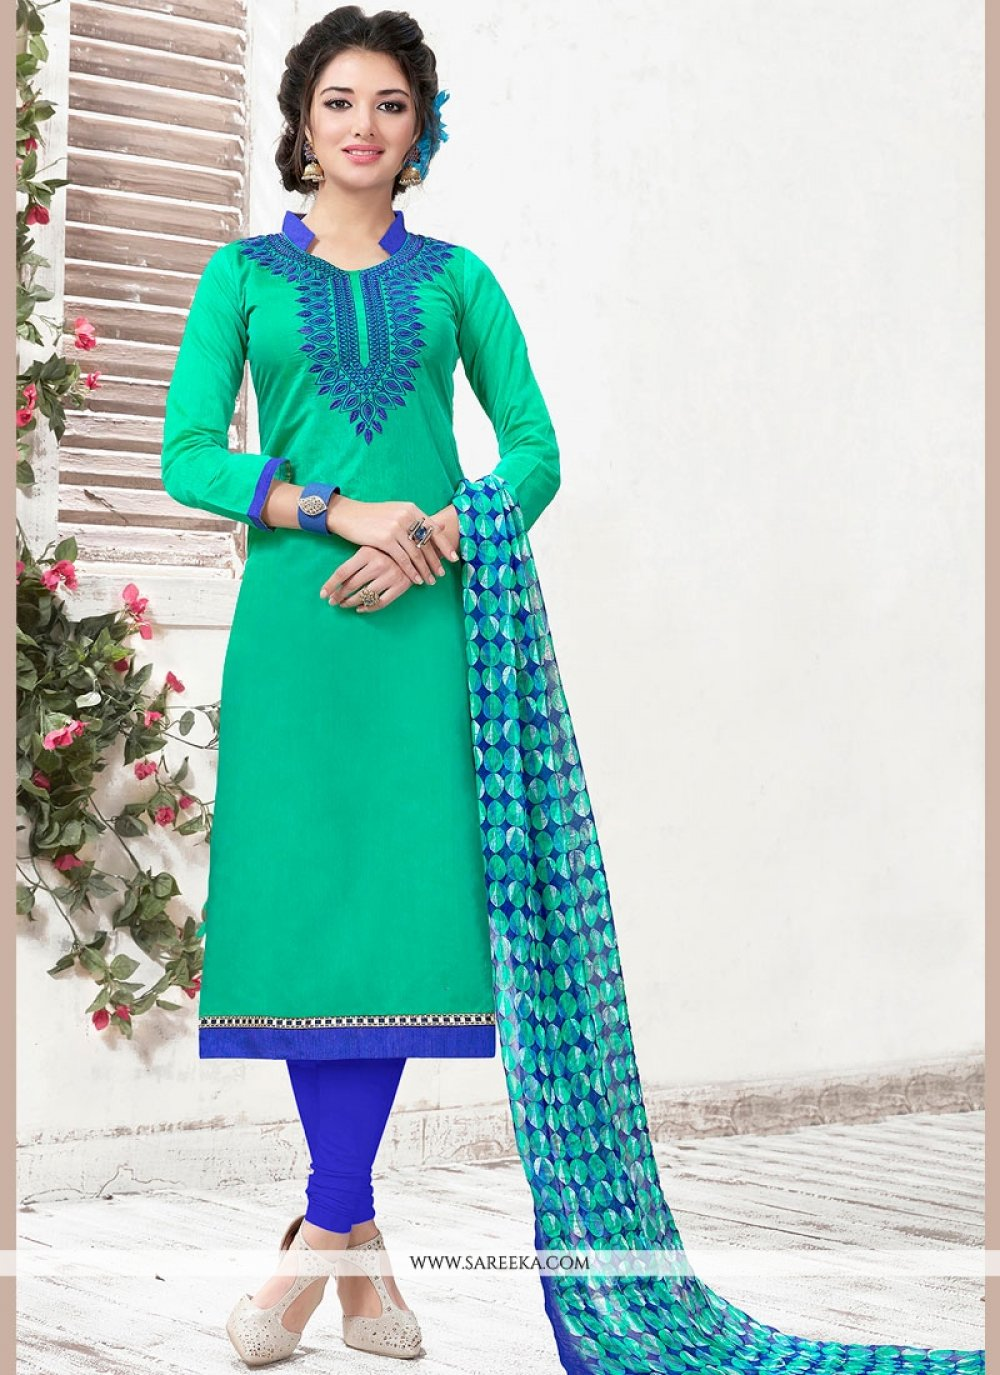 Chanderi Sea Green Lace Work Churidar Suit